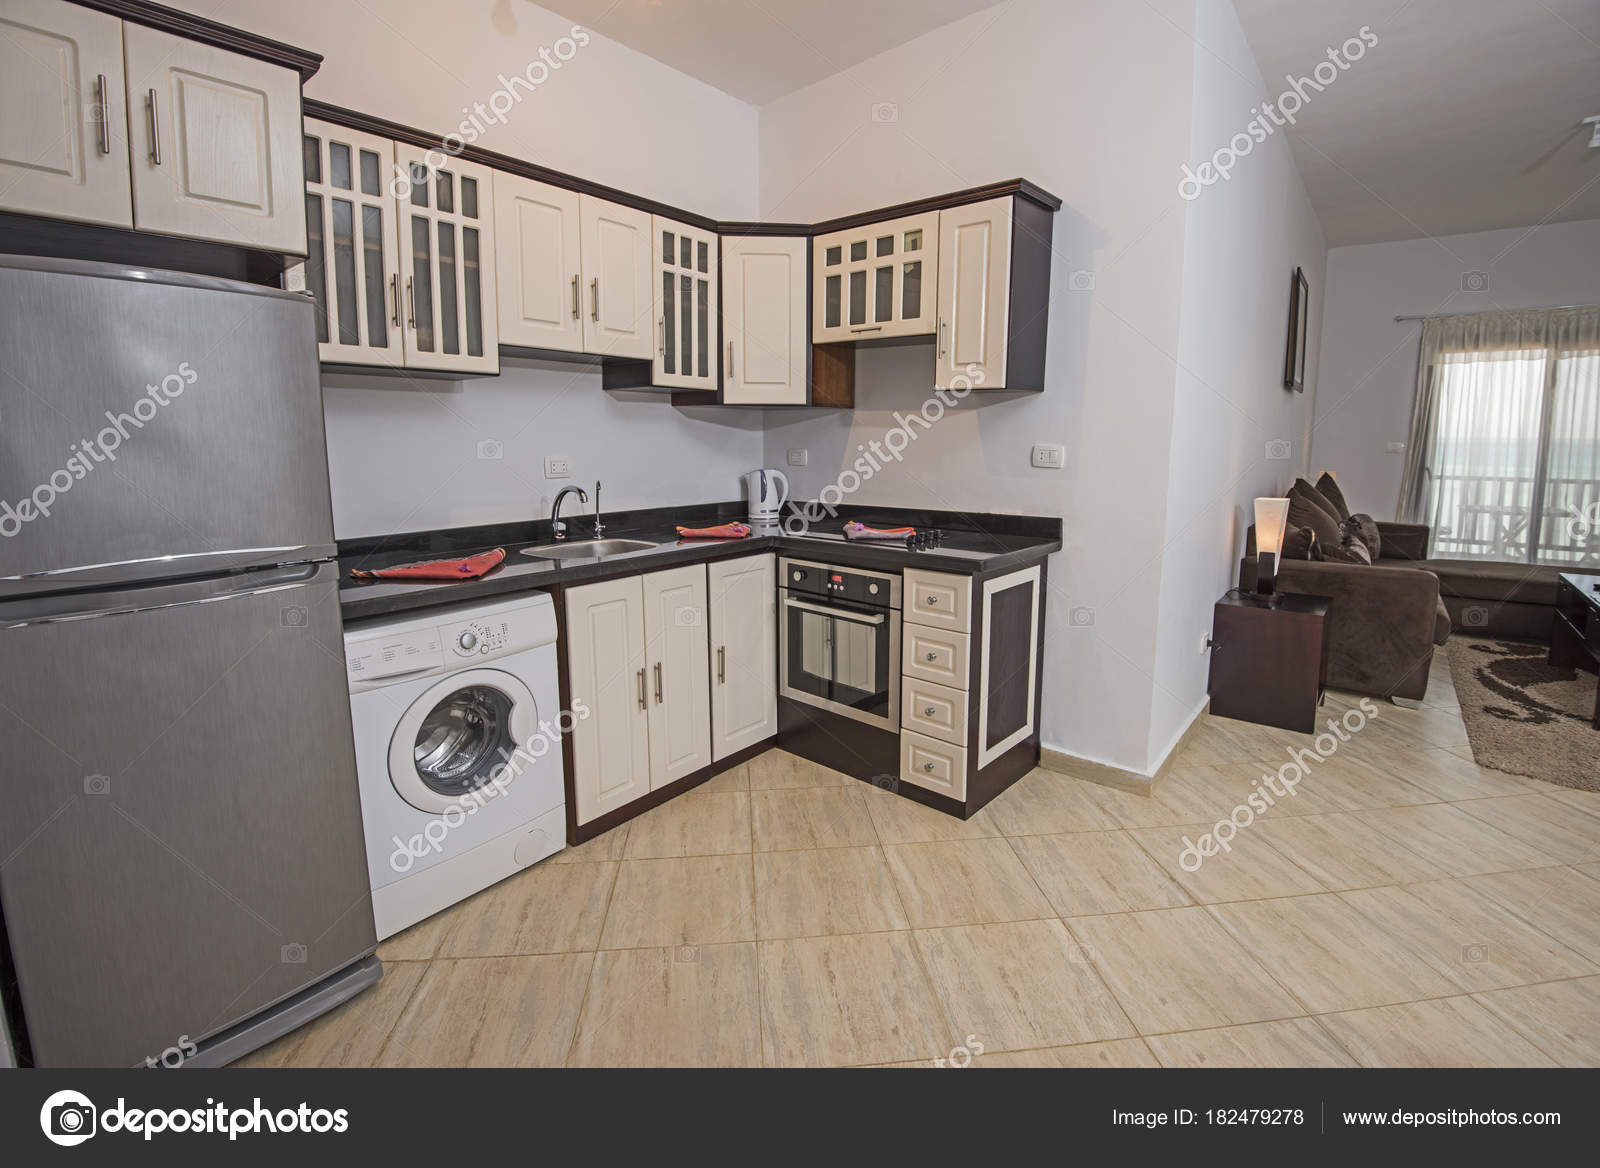 burgundy kitchen decor aid bowls 中显示家庭公寓的厨房室内装饰设计 图库照片 c paulvinten 182479278